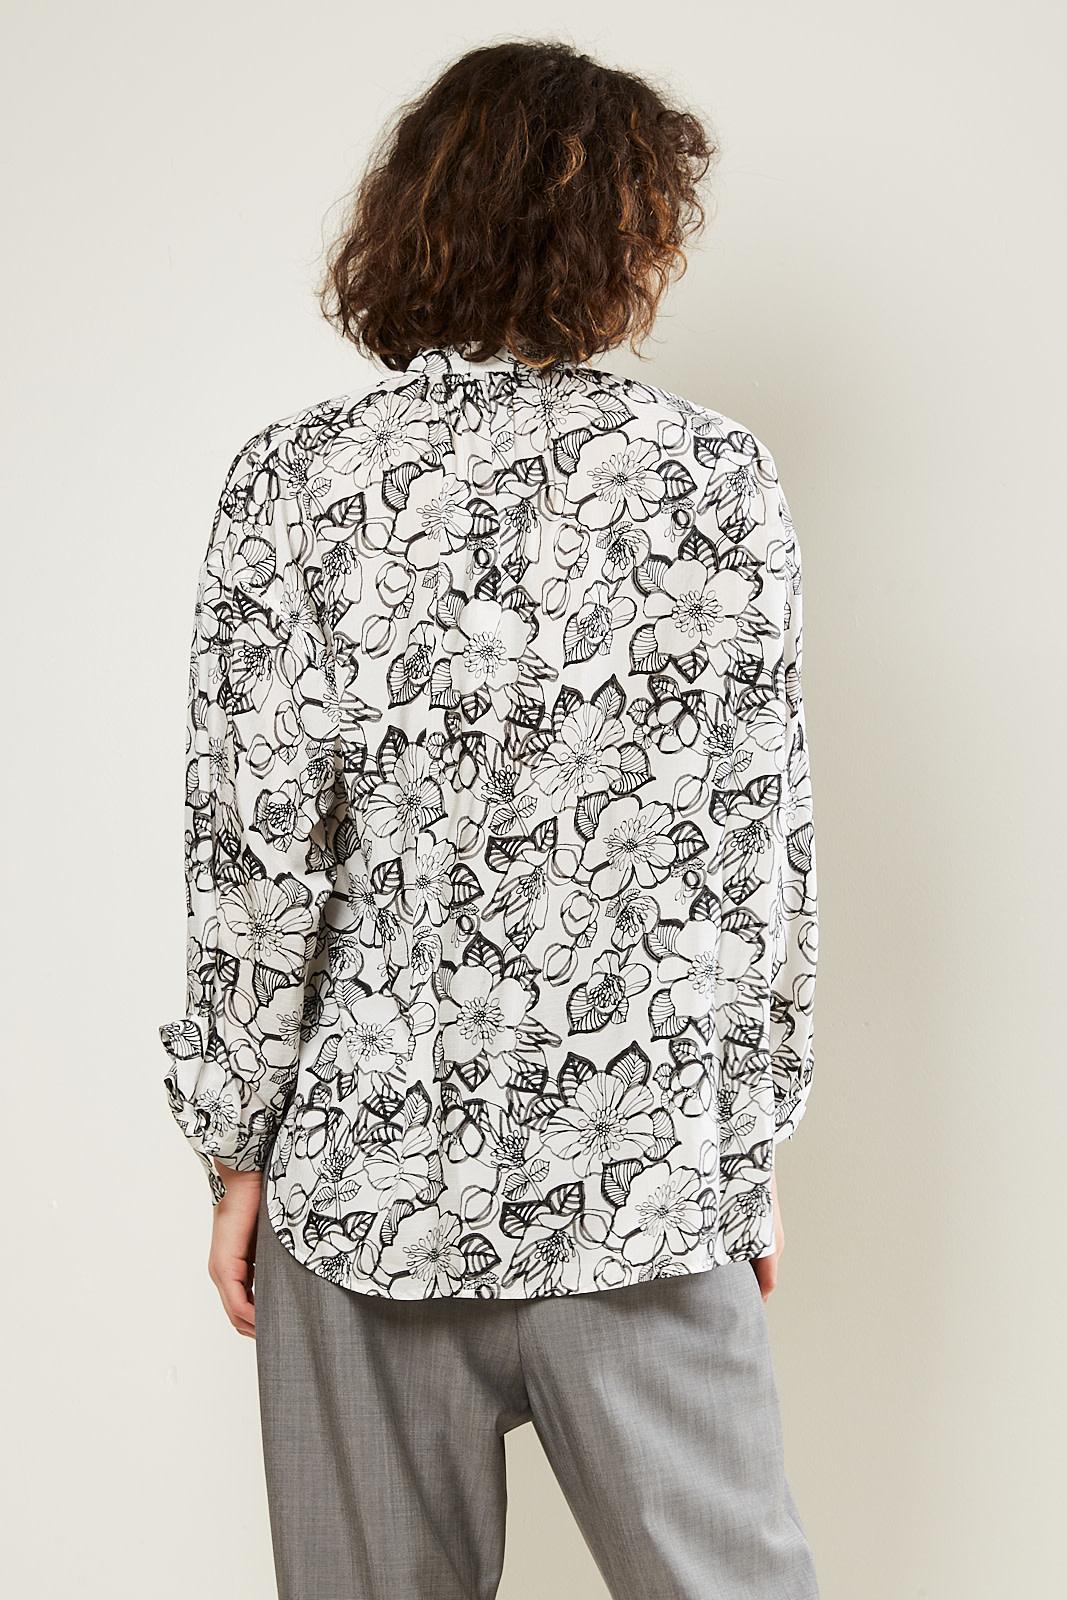 Christian Wijnants - Tanny romantic blouse